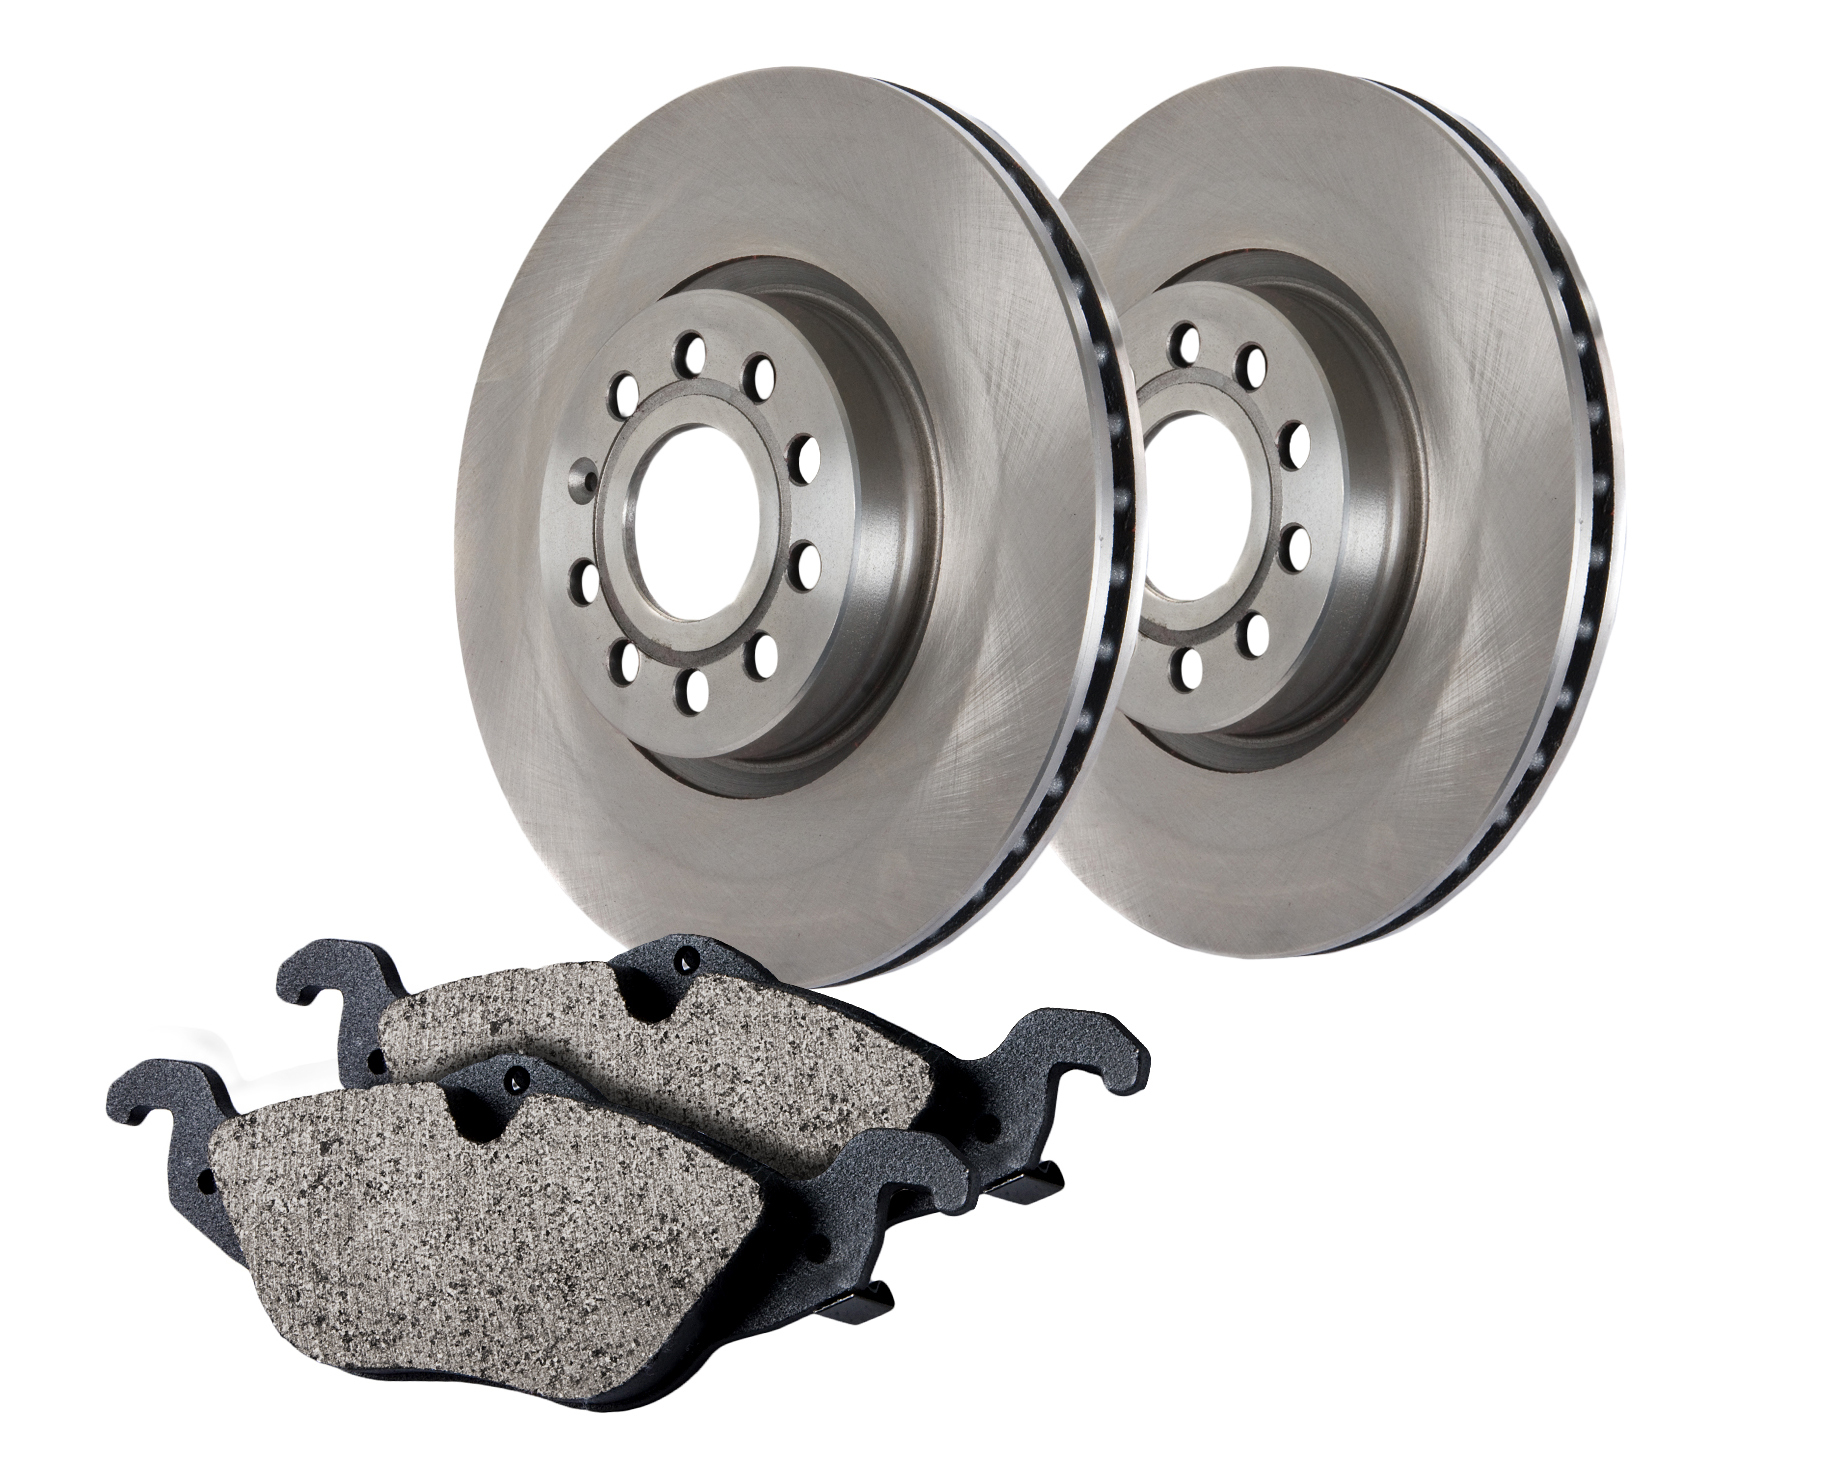 Centric Brake Parts 905.50003 Brake Rotor and Pad Kit, Premium, Semi-Metallic Pads, Iron, Natural, Hyundai Entourage 2007-08 / Kia Sedona 2007-14, Kit